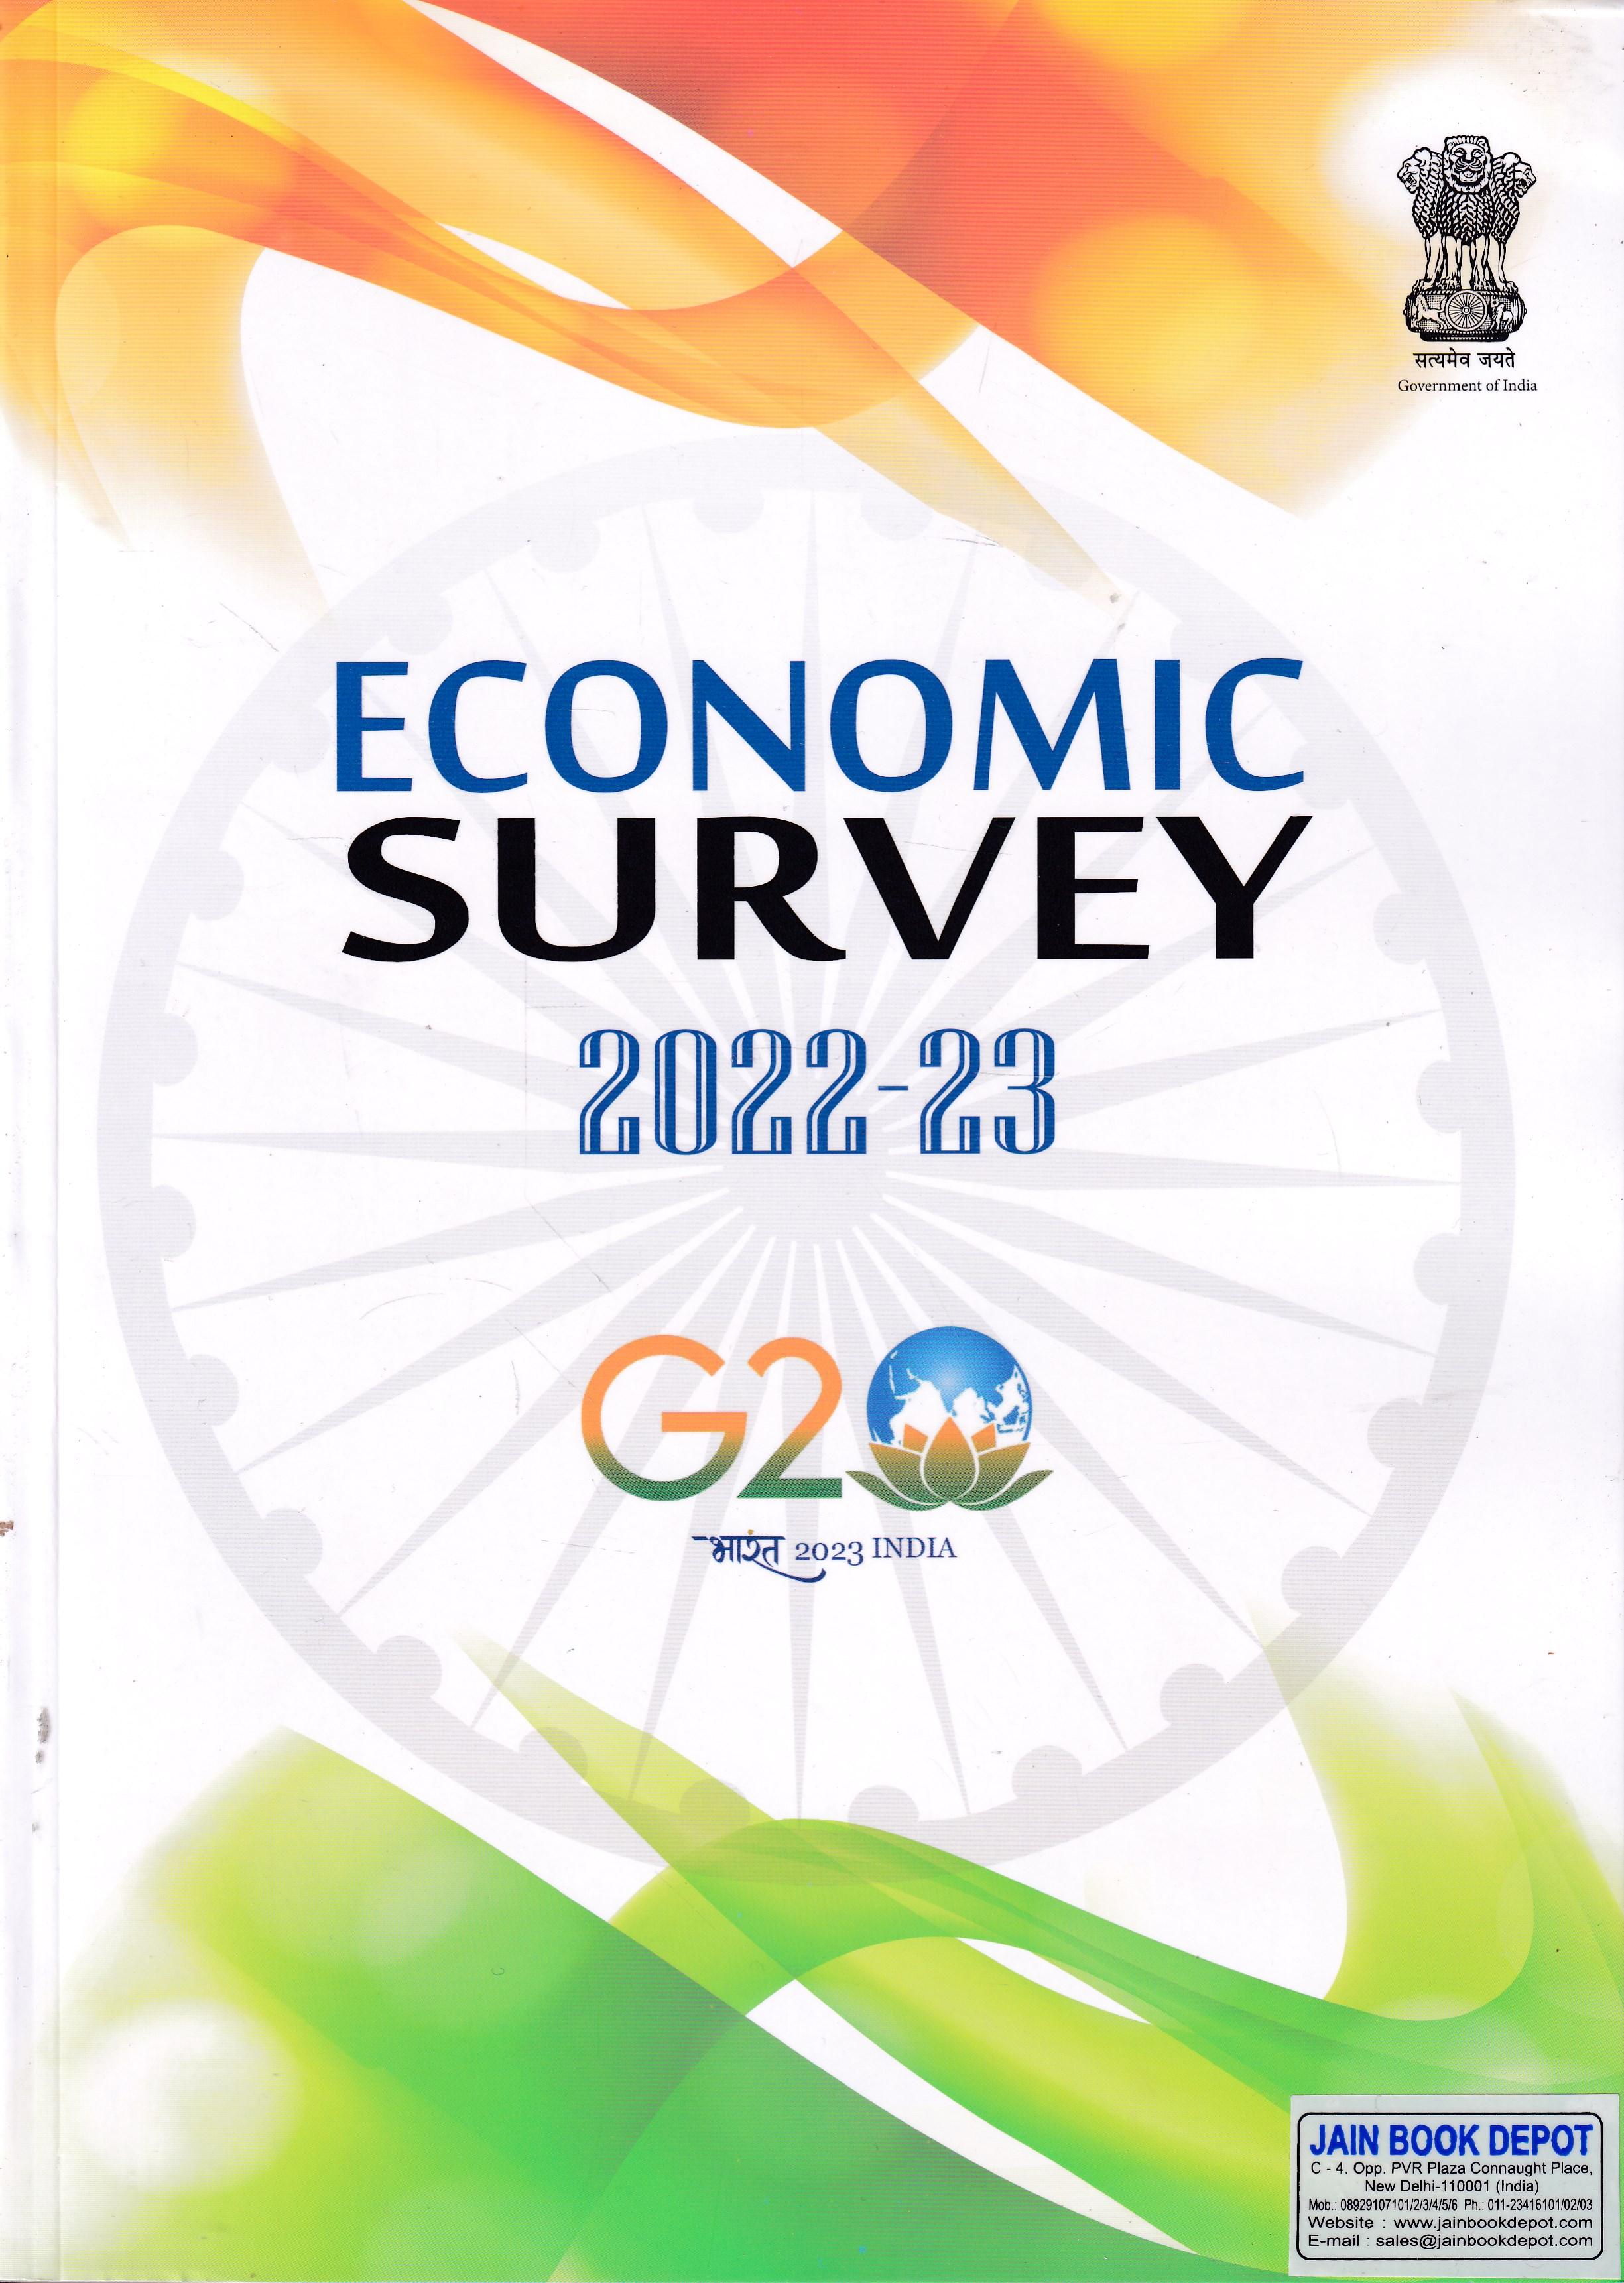 Economic Survey 2018-19 In 2 Vols